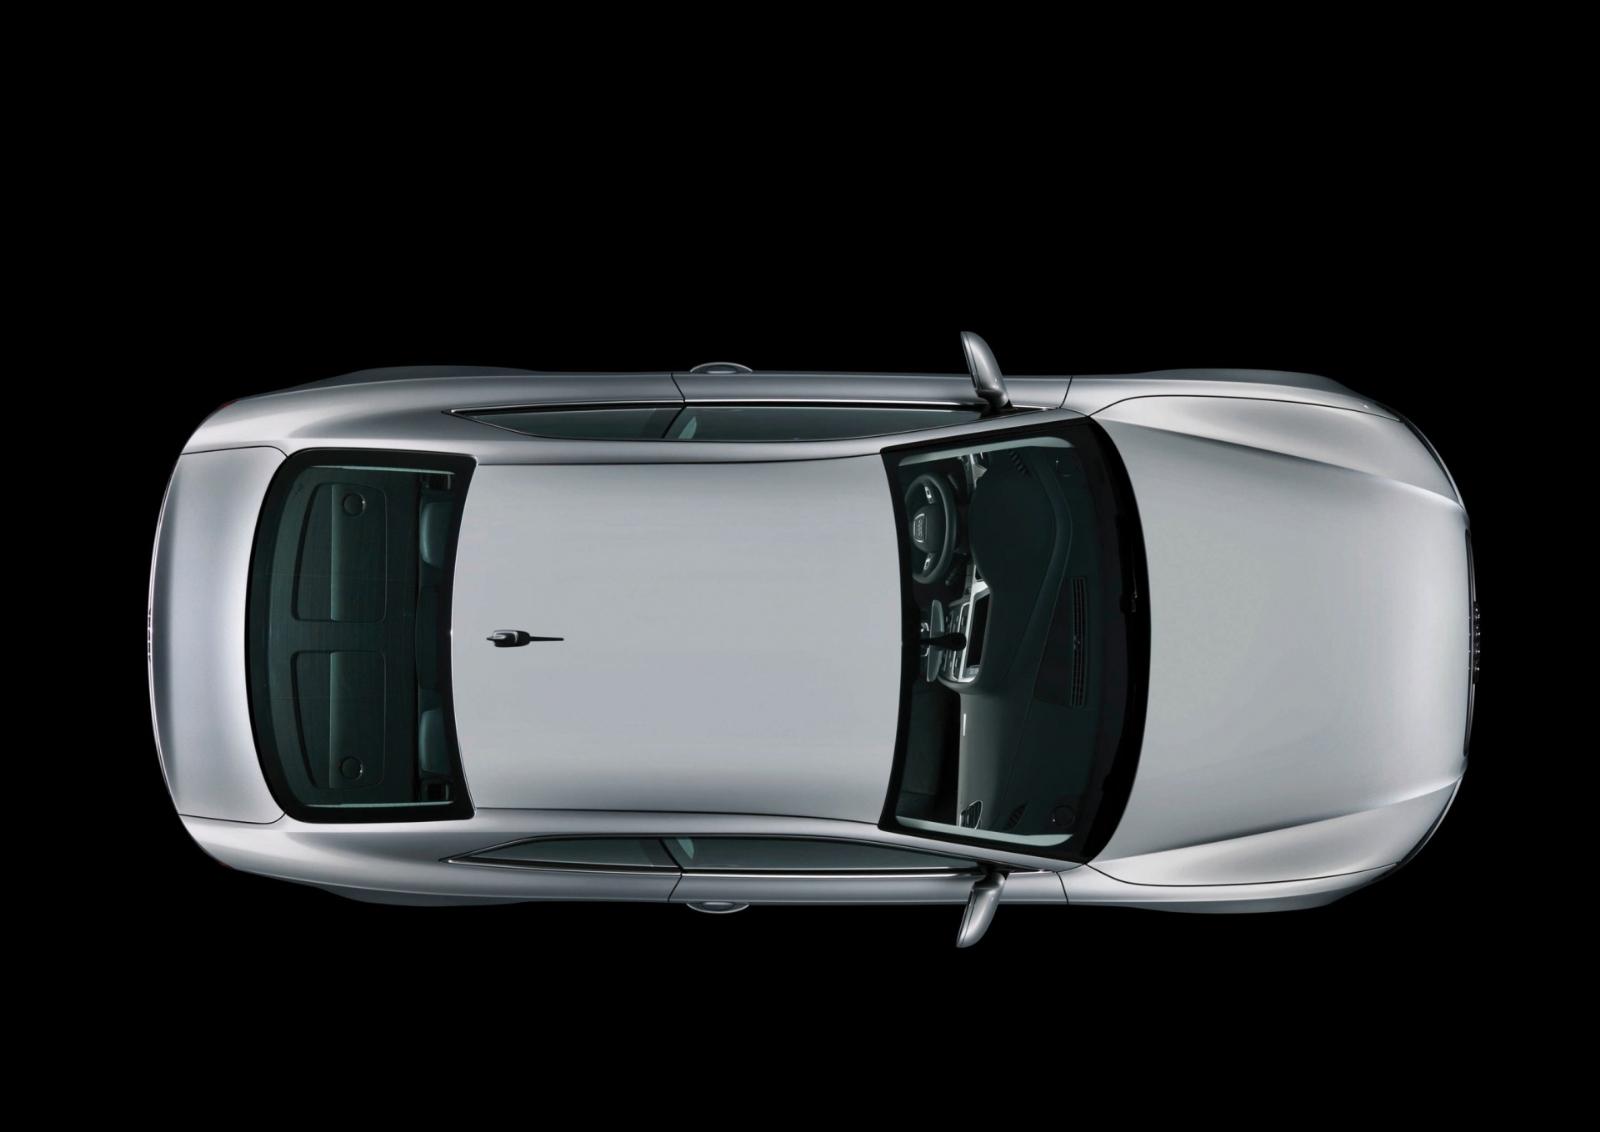 2008 Audi A5